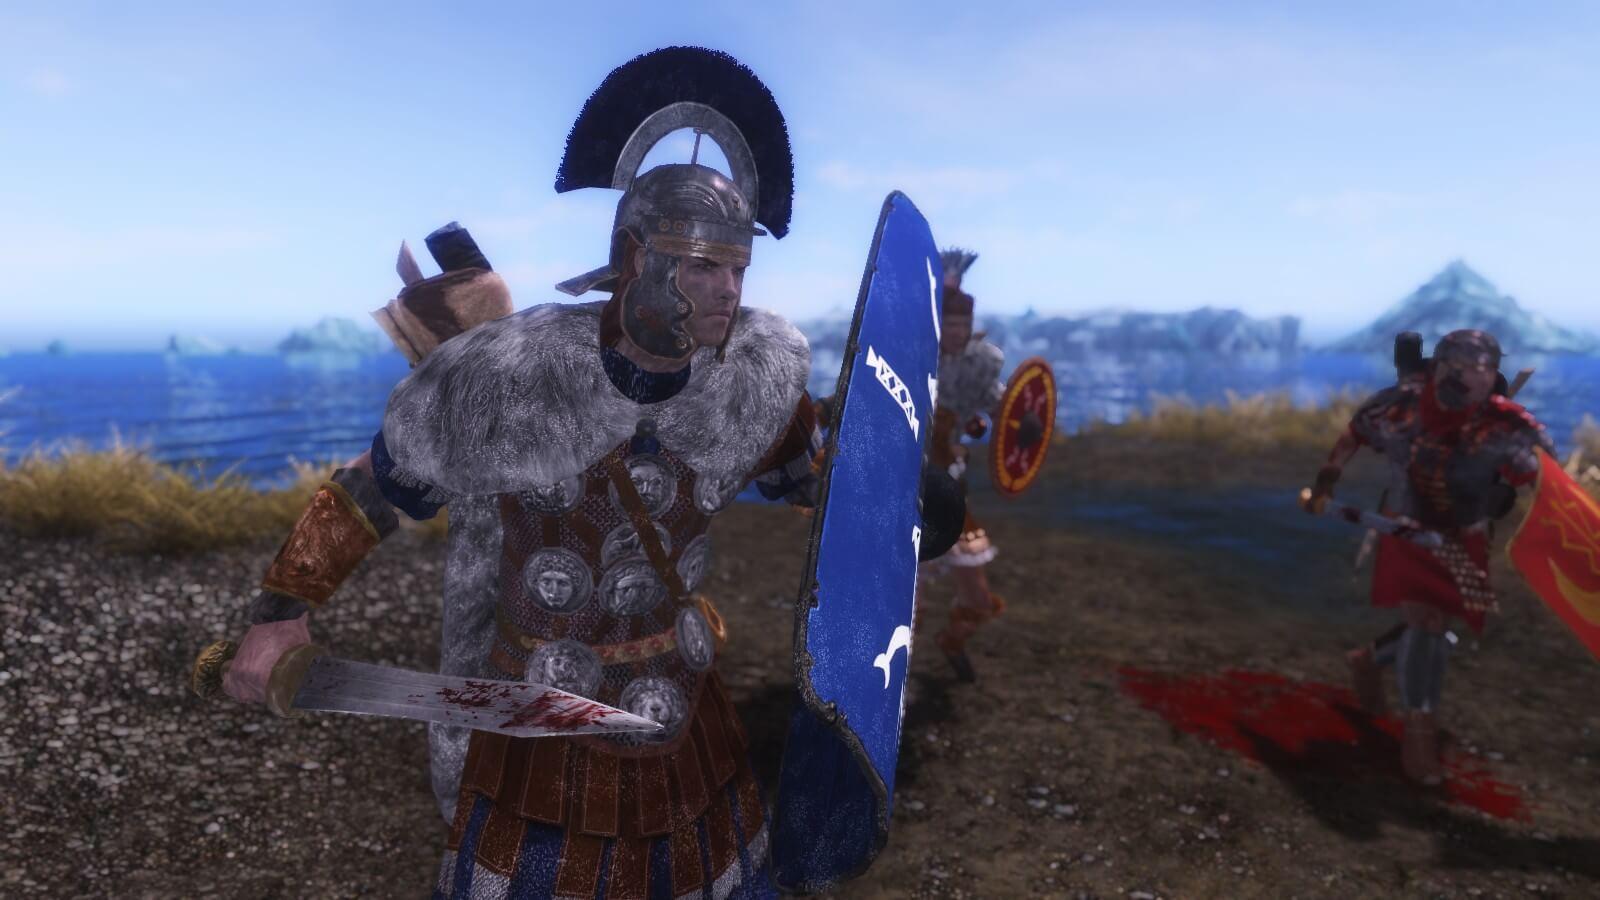 Skyrim - Броня и оружие римлян / Roman Imperial armor and weapons